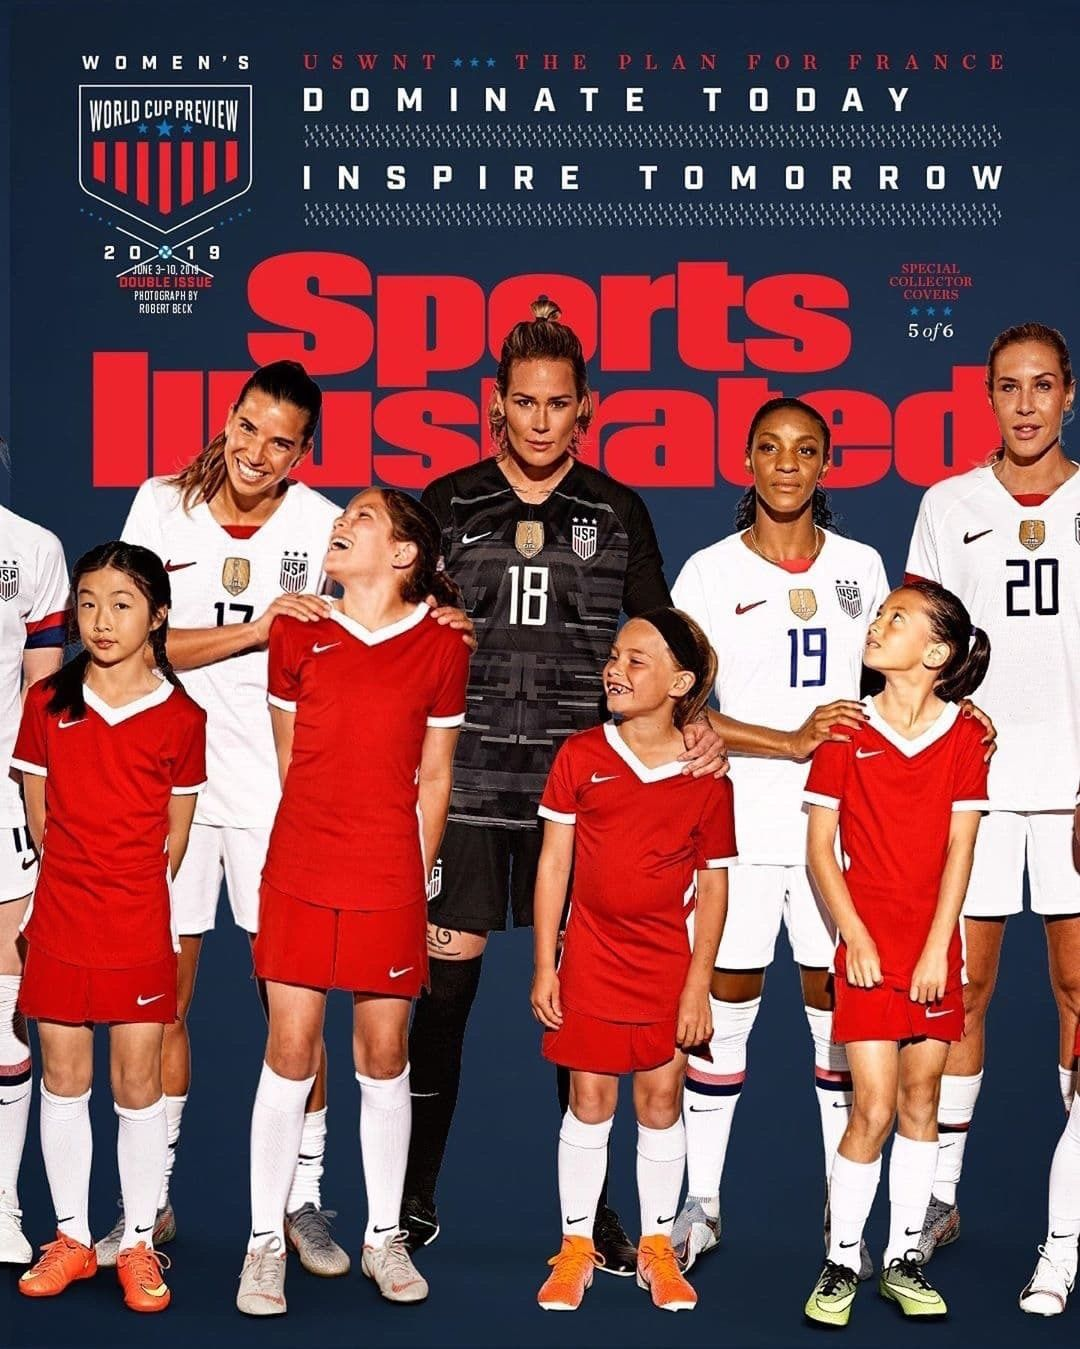 Tobin Heath Ashlyn Harris Crystal Dunn And Allie Long Uswnt Sports Illustrated 2019 Women S World Cup P Sports Illustrated Covers Sports Illustrated Uswnt